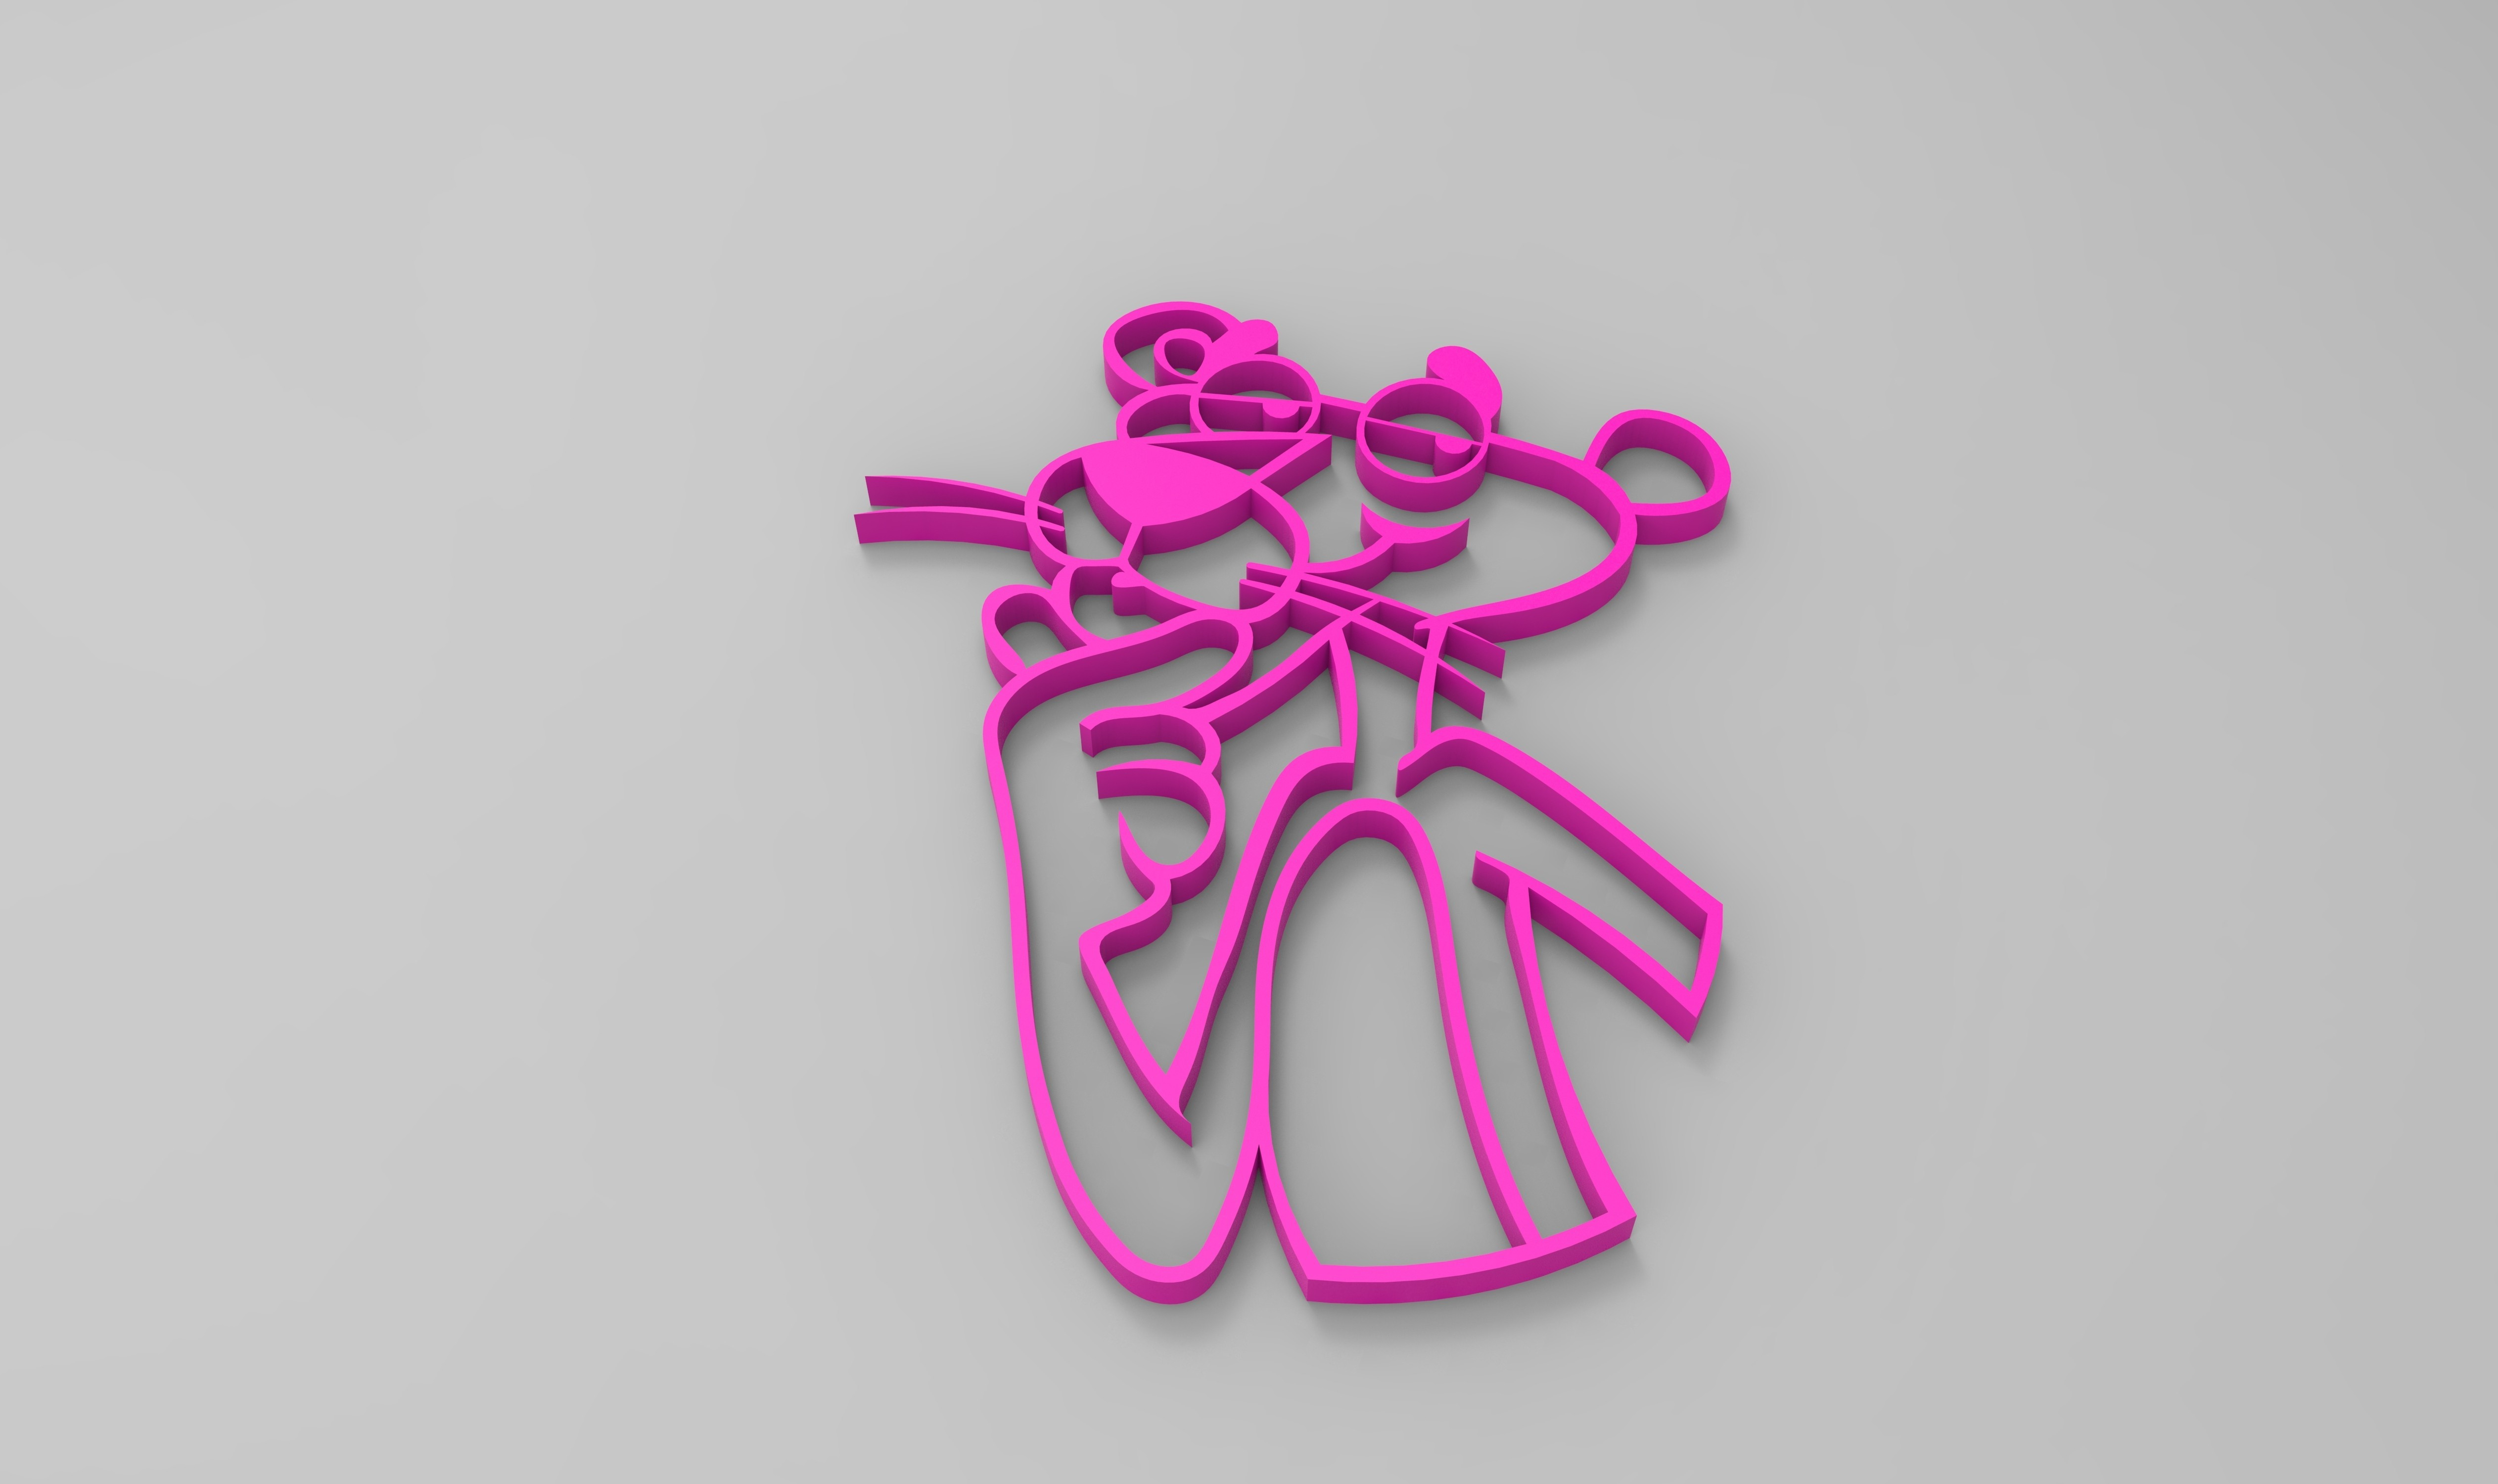 rendu panthere rose.jpg Download STL file pink panther • 3D print model, GuilhemPerroud